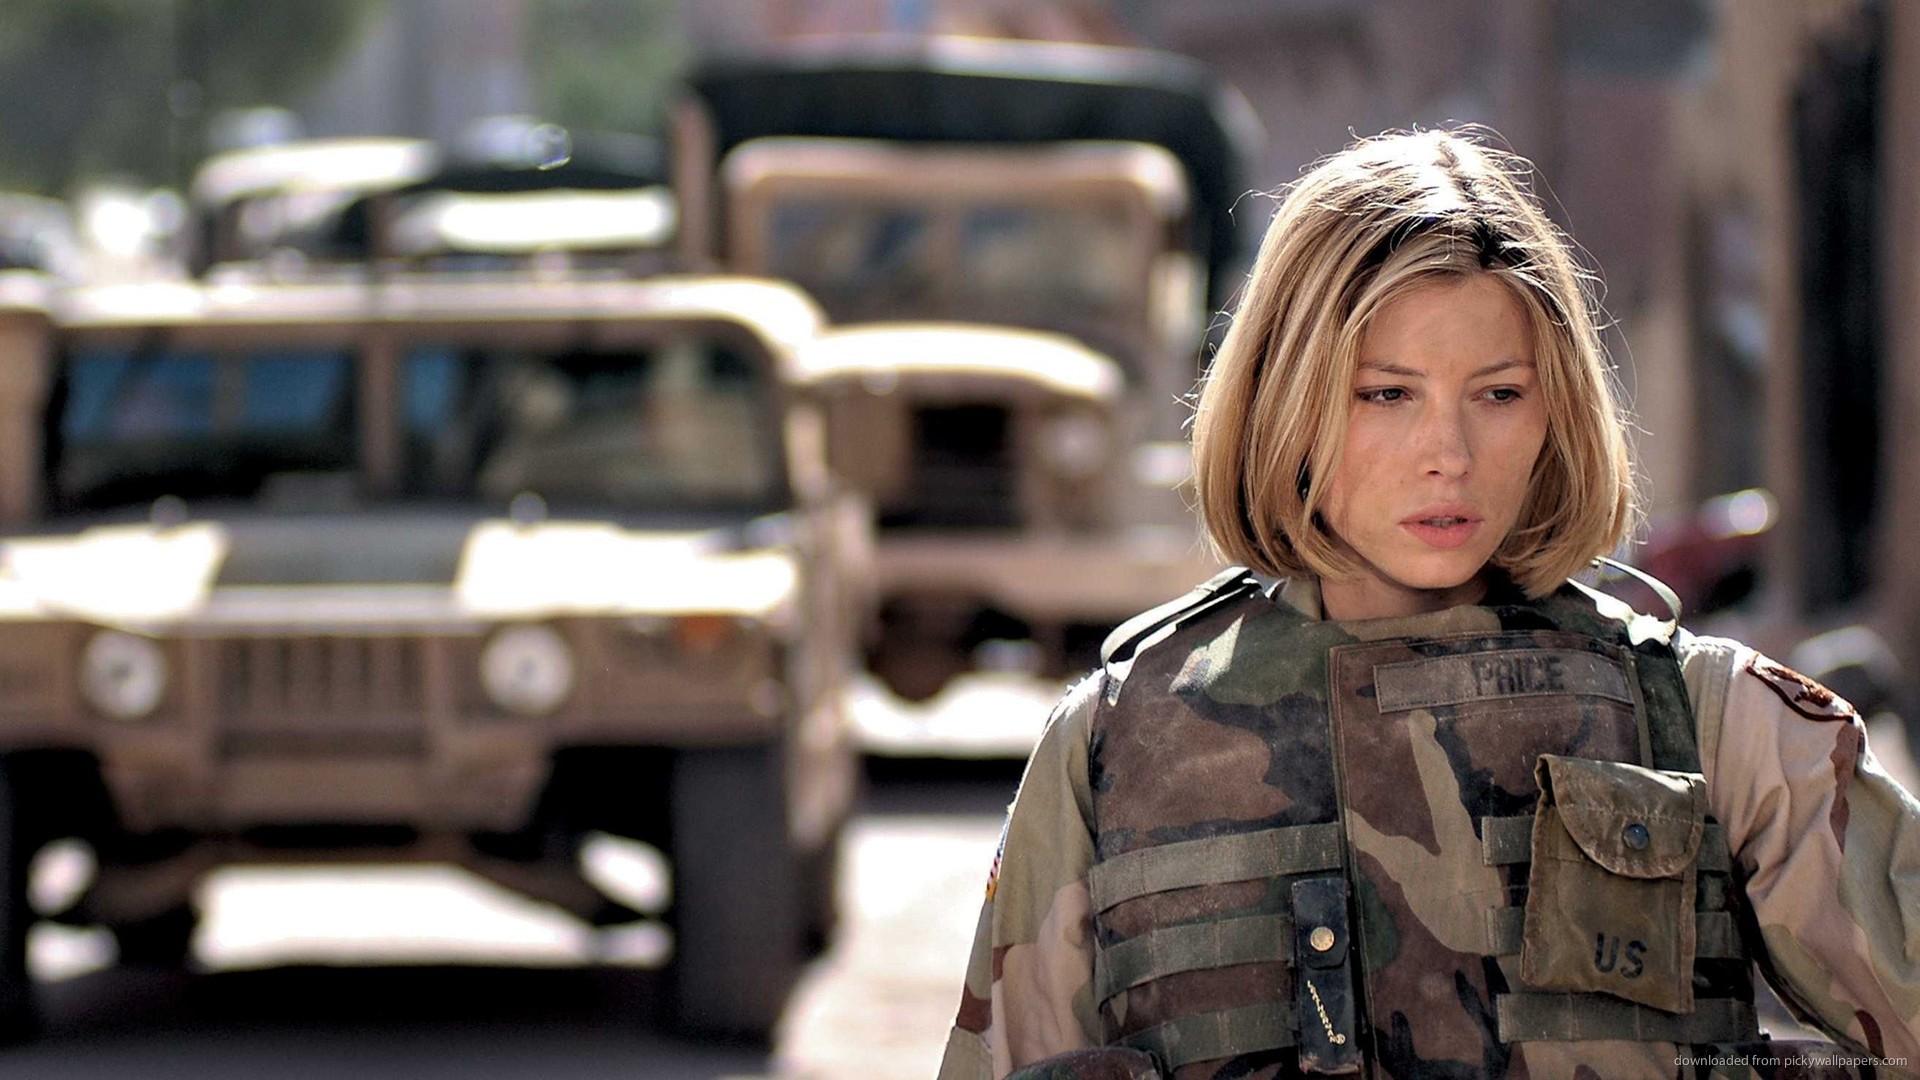 Jessica Biel Military Uniform Wallpaper For Samsung Galaxy Tab